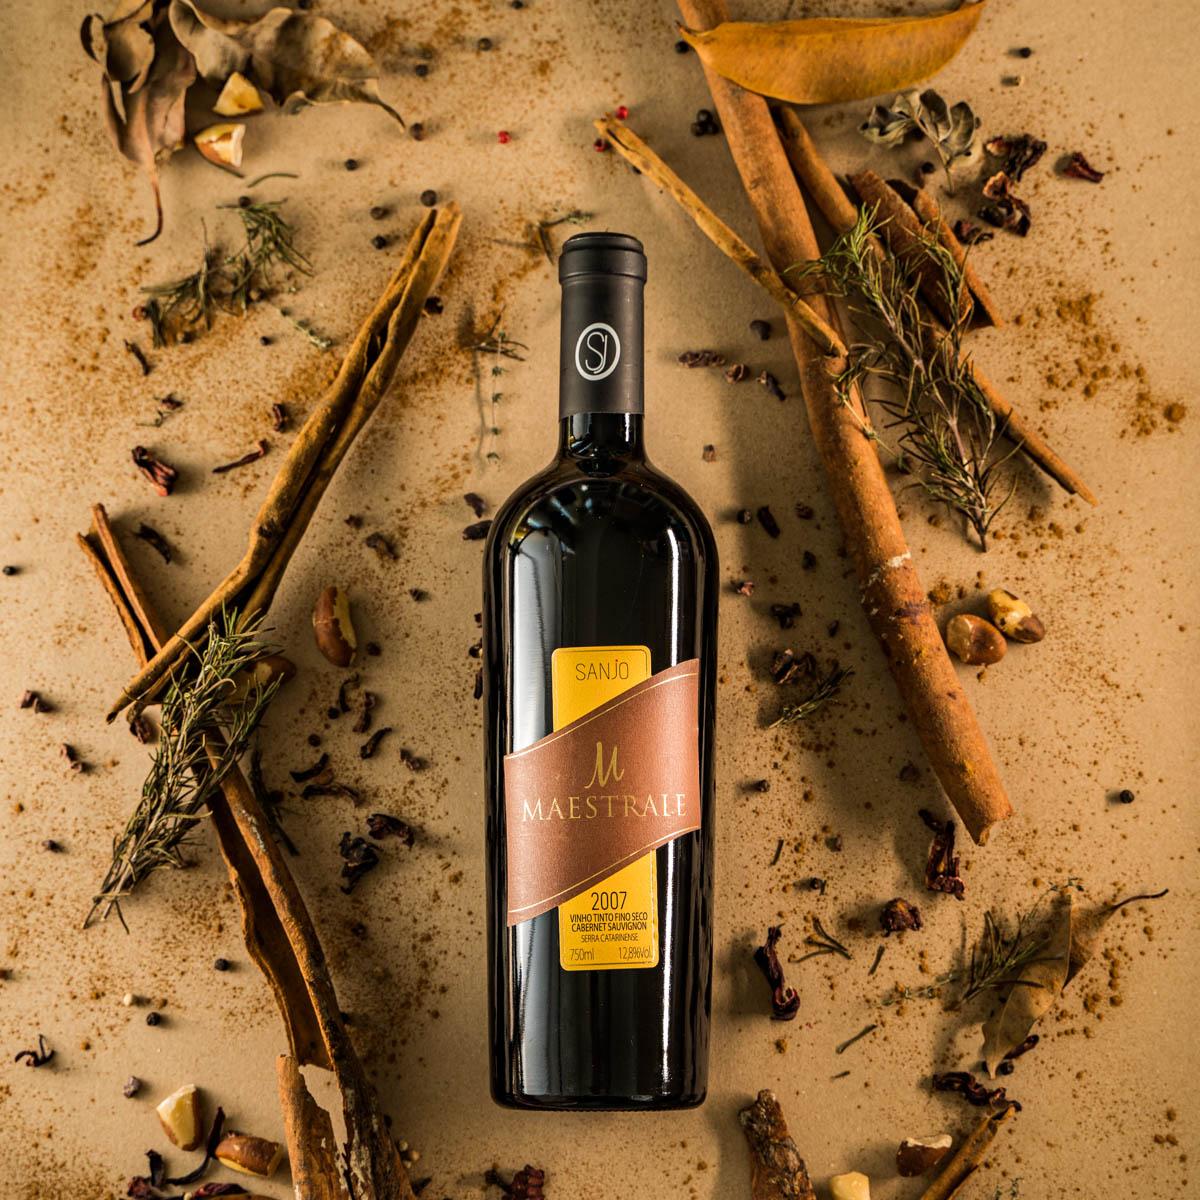 Vinho tinto Maestrale - Cabernet Sauvignon 2007 - Vinícola Sanjo